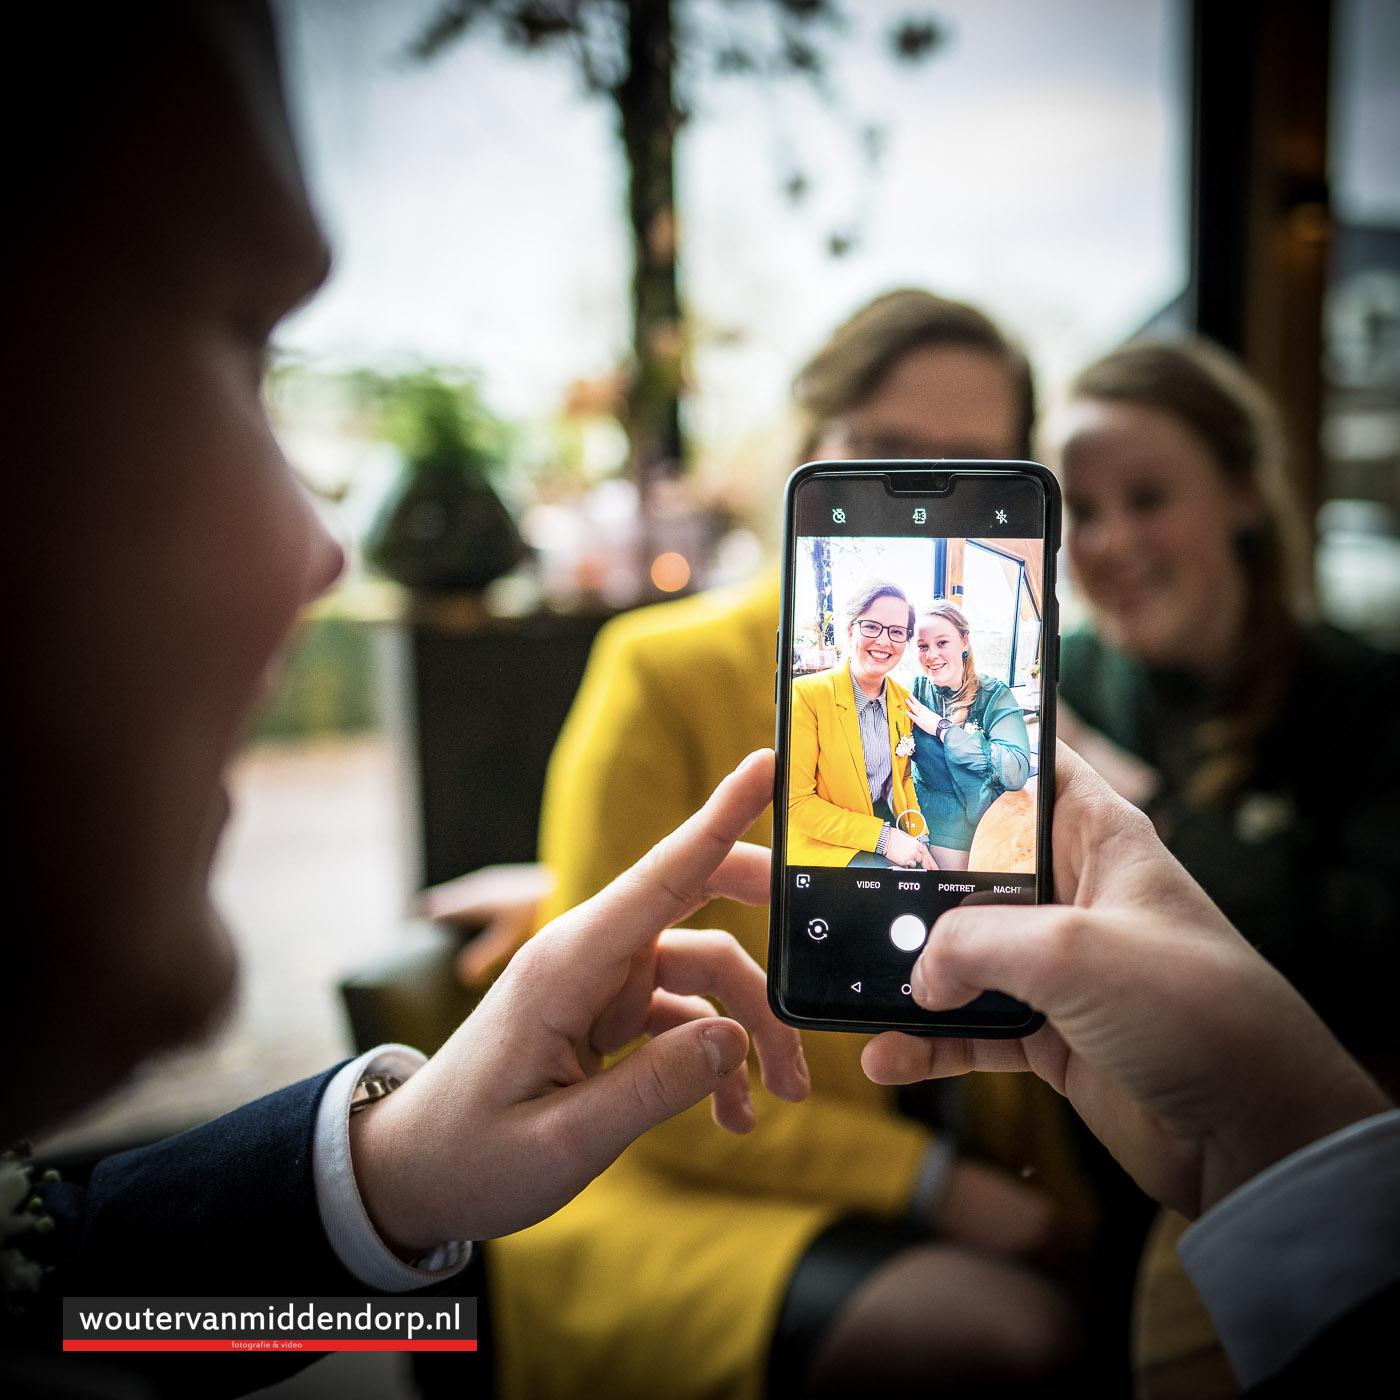 bruidsfotografie Wouter van Middendorp Uddel Elspeet Barneveld, omgeving trouwfotograaf-29